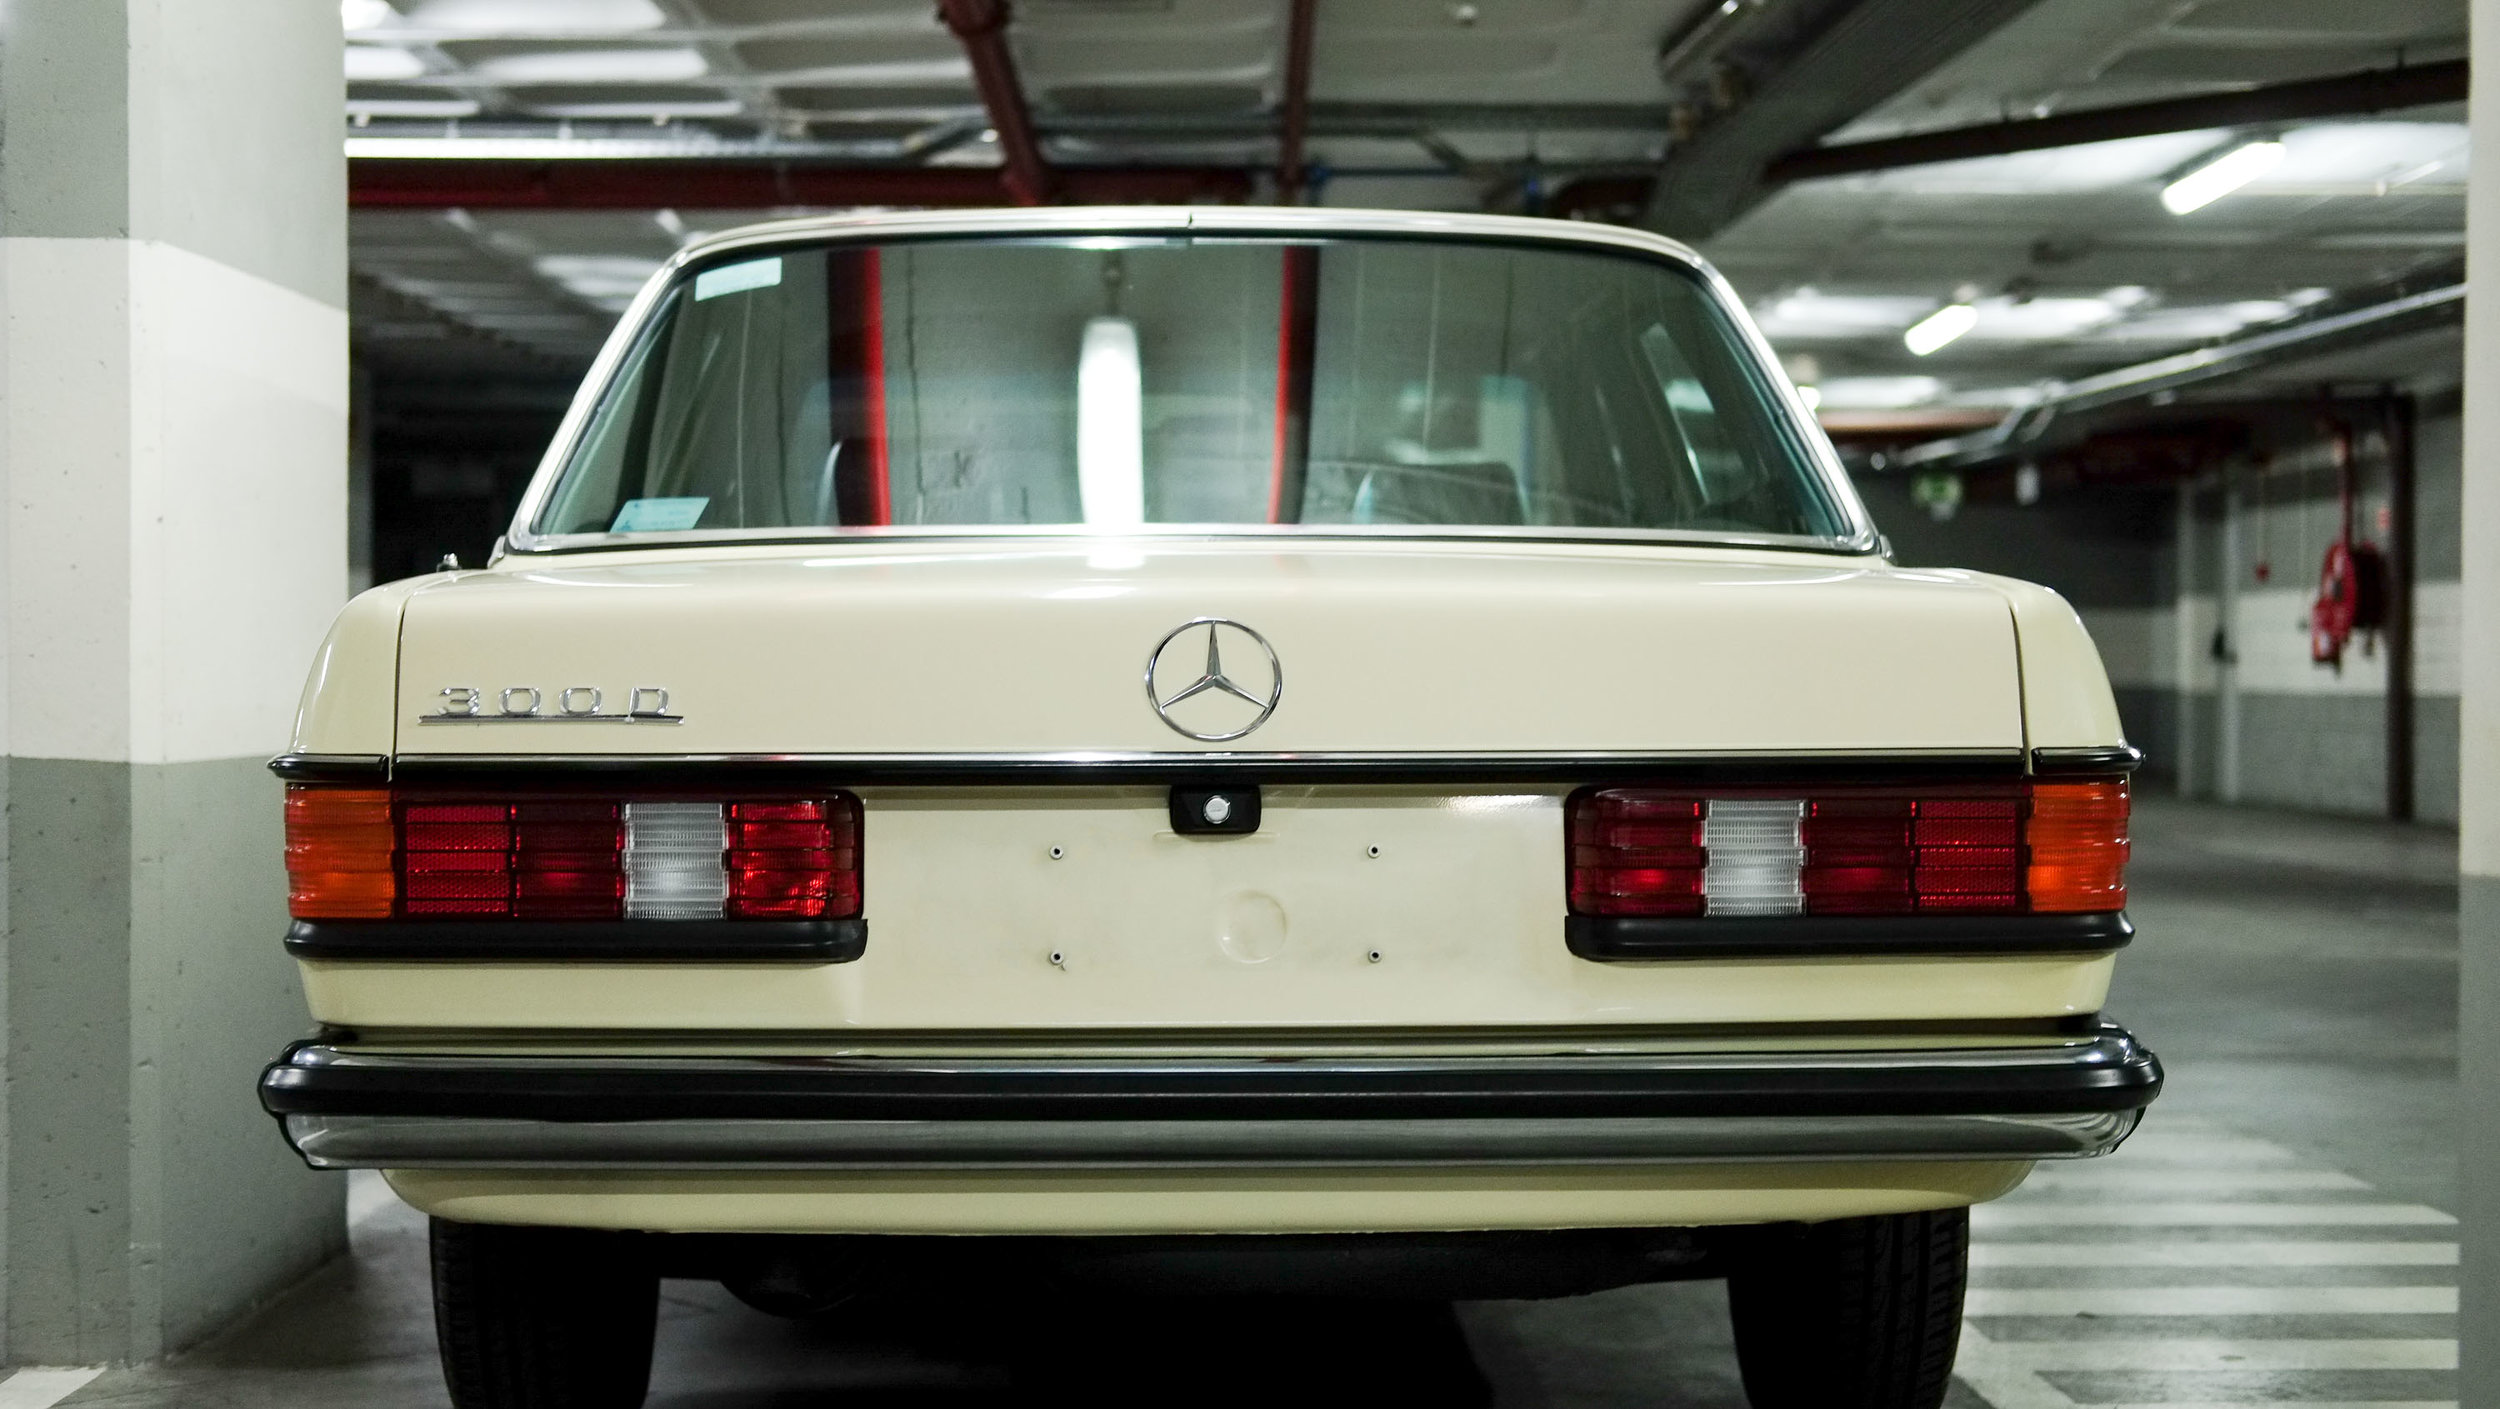 coolnvintage Mercedes-Benz W123 300D (6 of 59).jpg